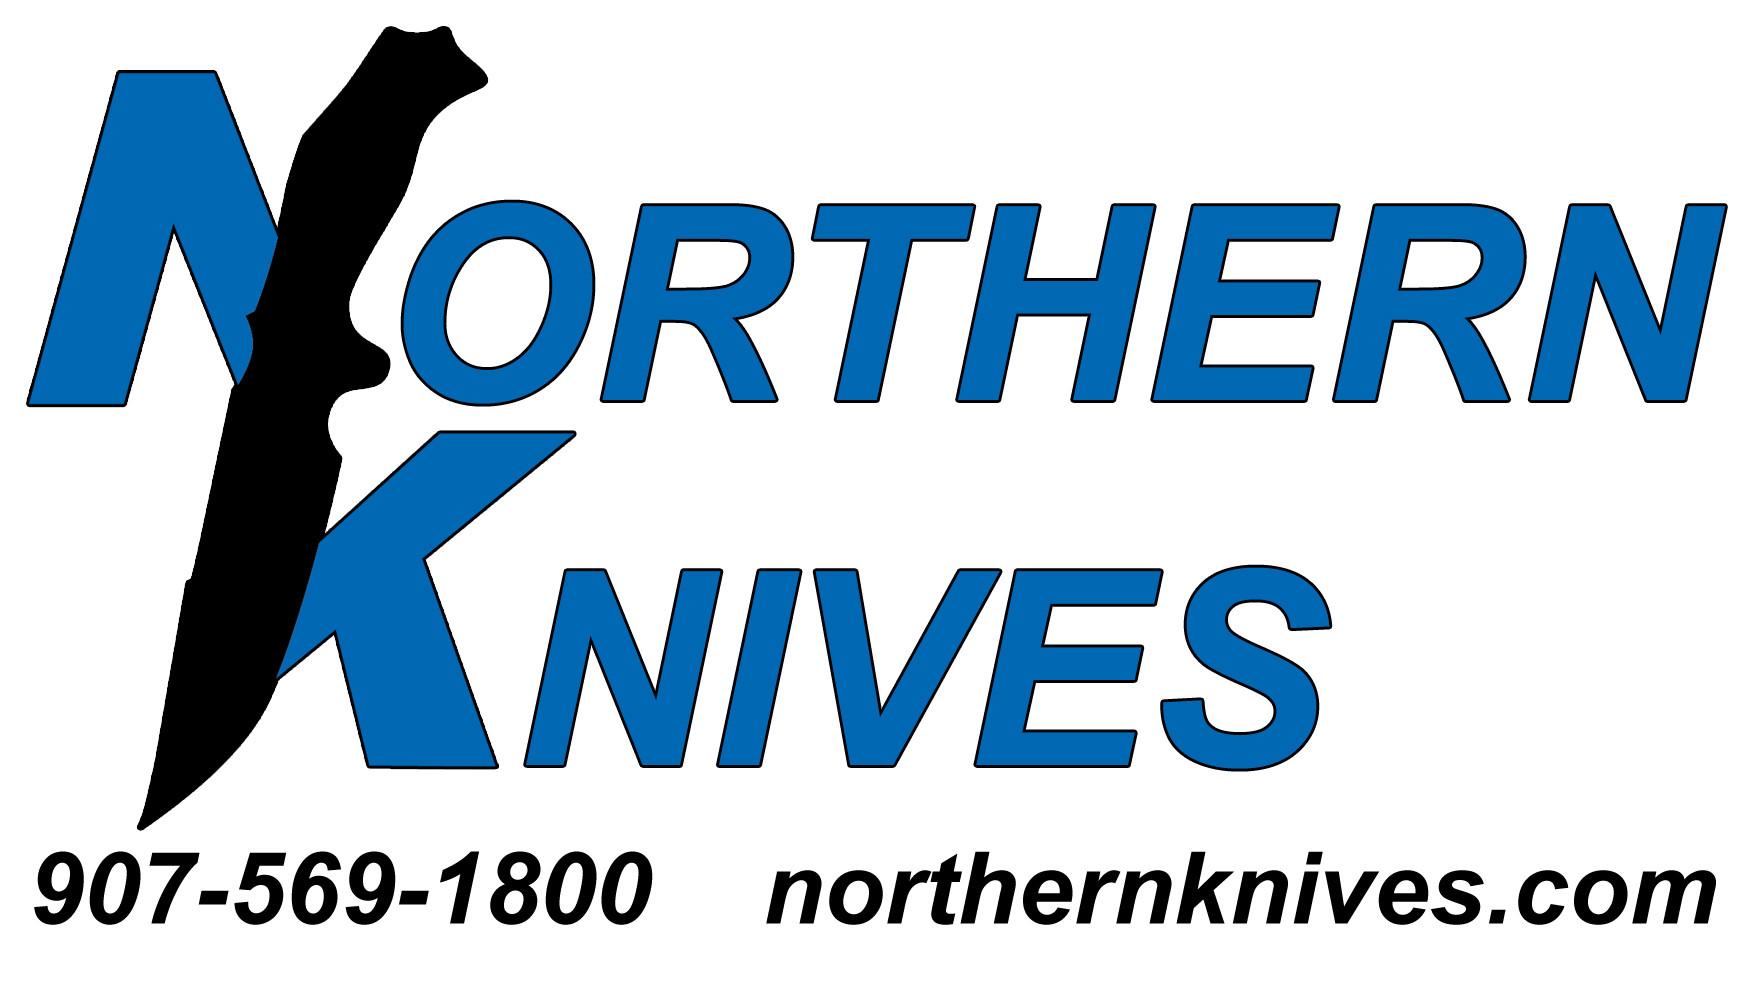 Northern Knives Alaska